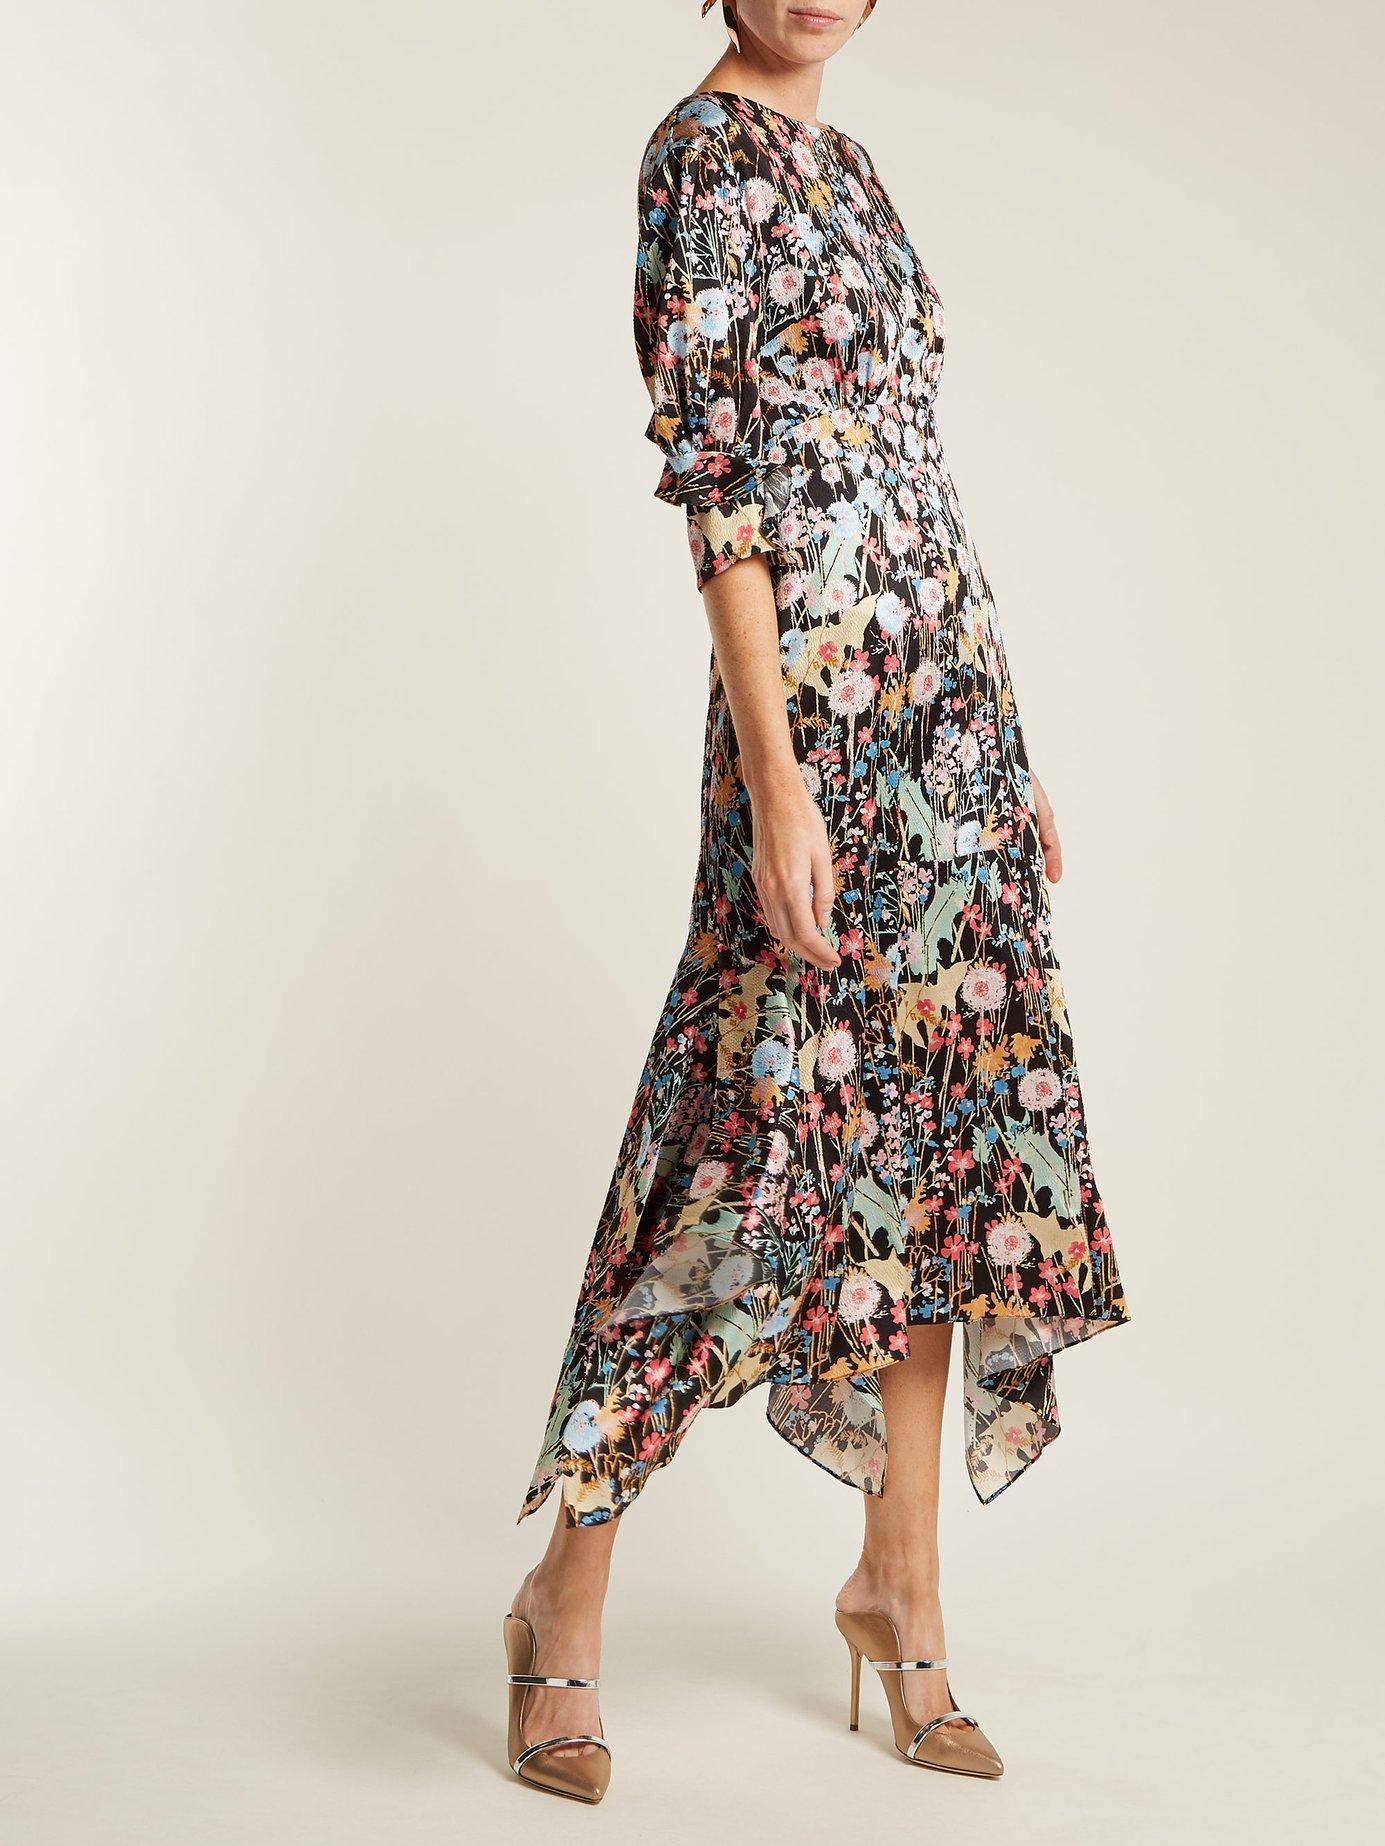 Dandelion-print silk dress by Peter Pilotto